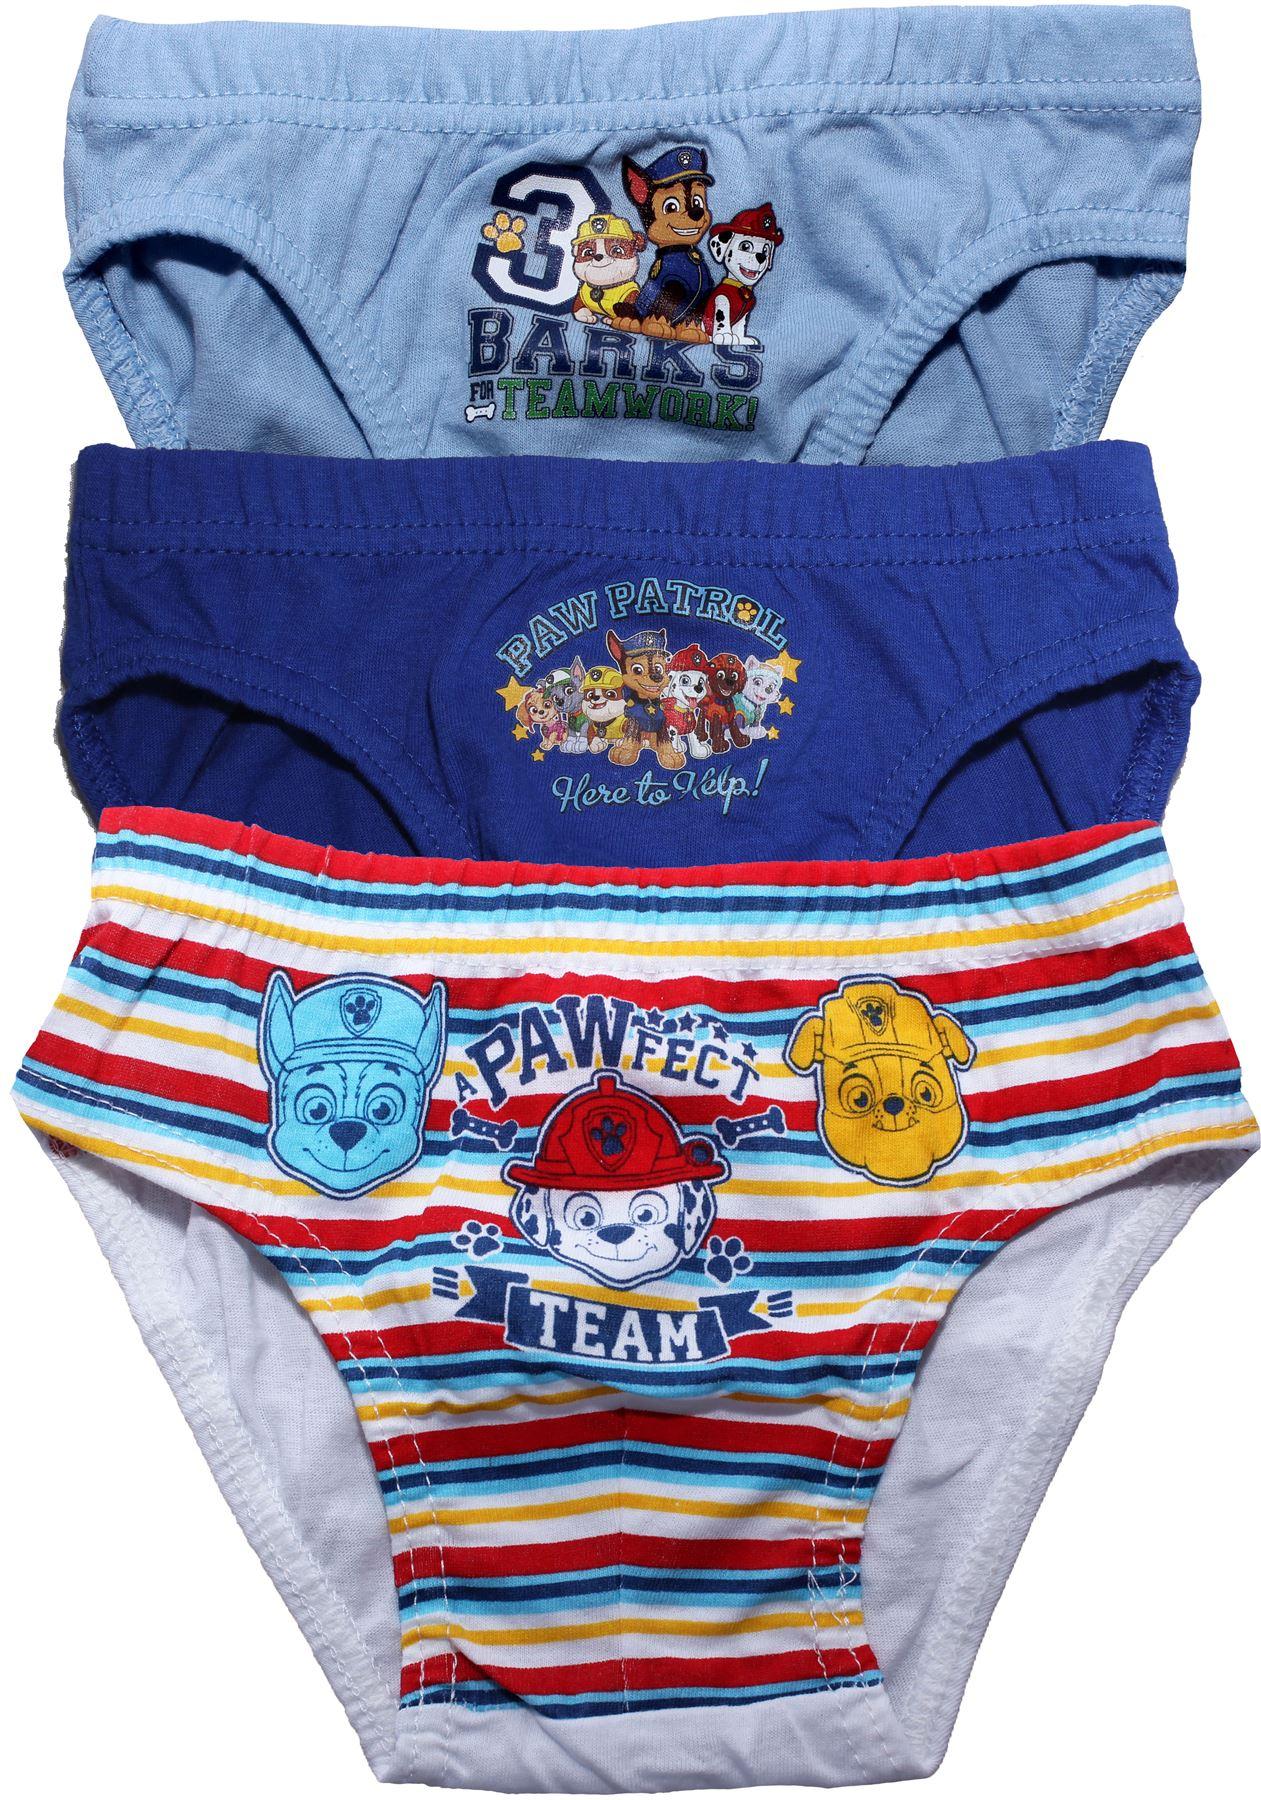 Boys Kids Paw Patrol Chase Pants Underwear Briefs Knickers Set 1-5 Years 3 Pack